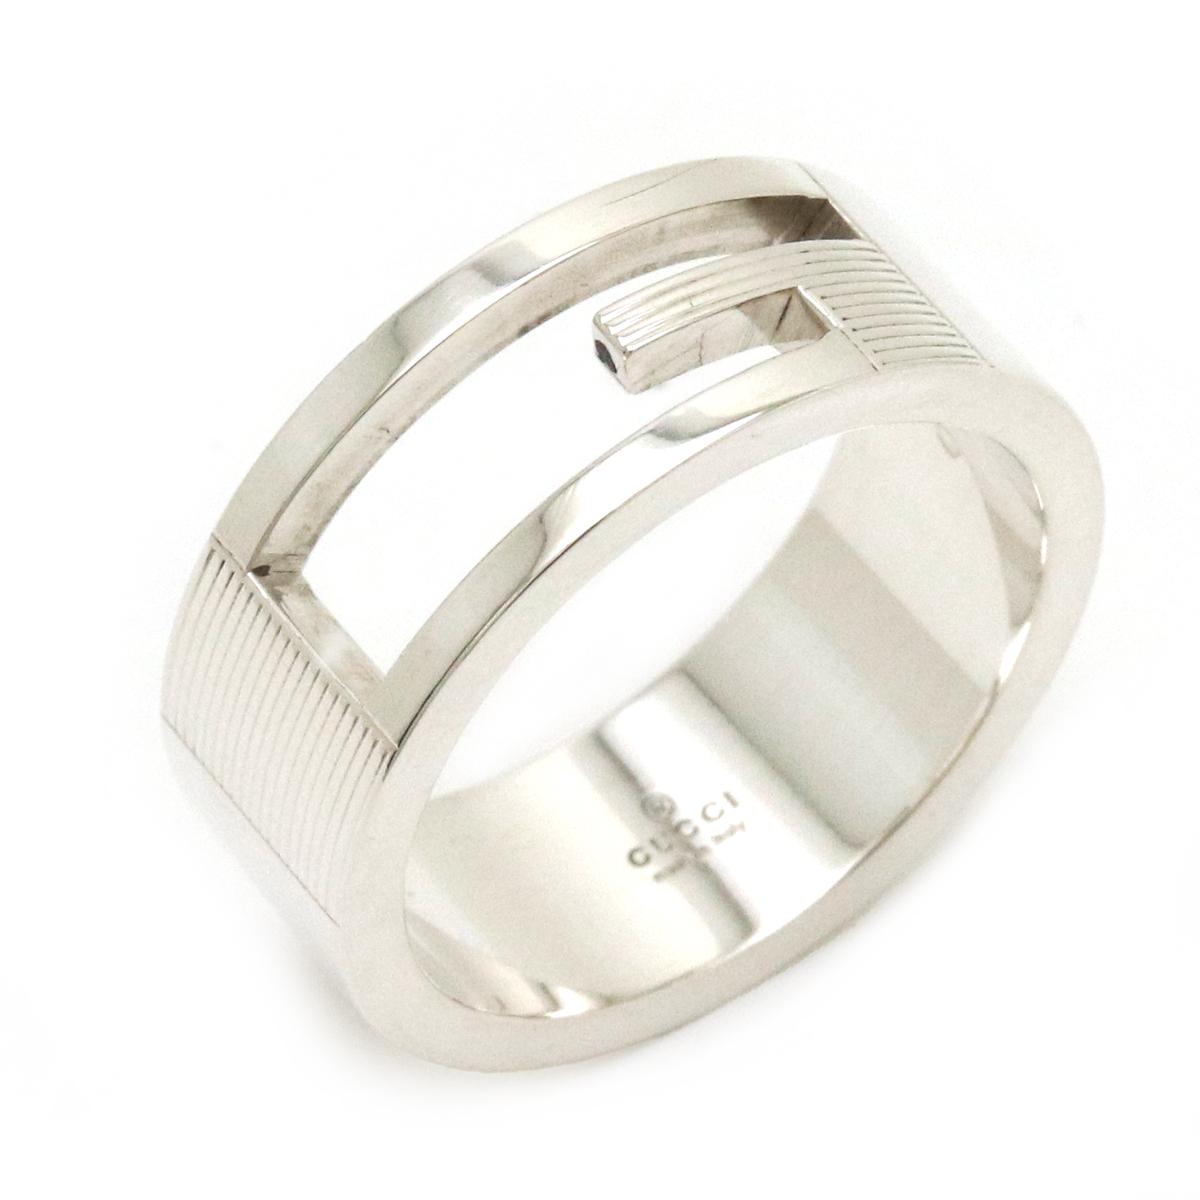 Sランク品 新品仕上げ済 ジュエリー GUCCI グッチ ブランデッドG リング オープンGリング 指輪 032660 シルバー 中古 18号 SV925 09840 #58 おしゃれ 贈呈